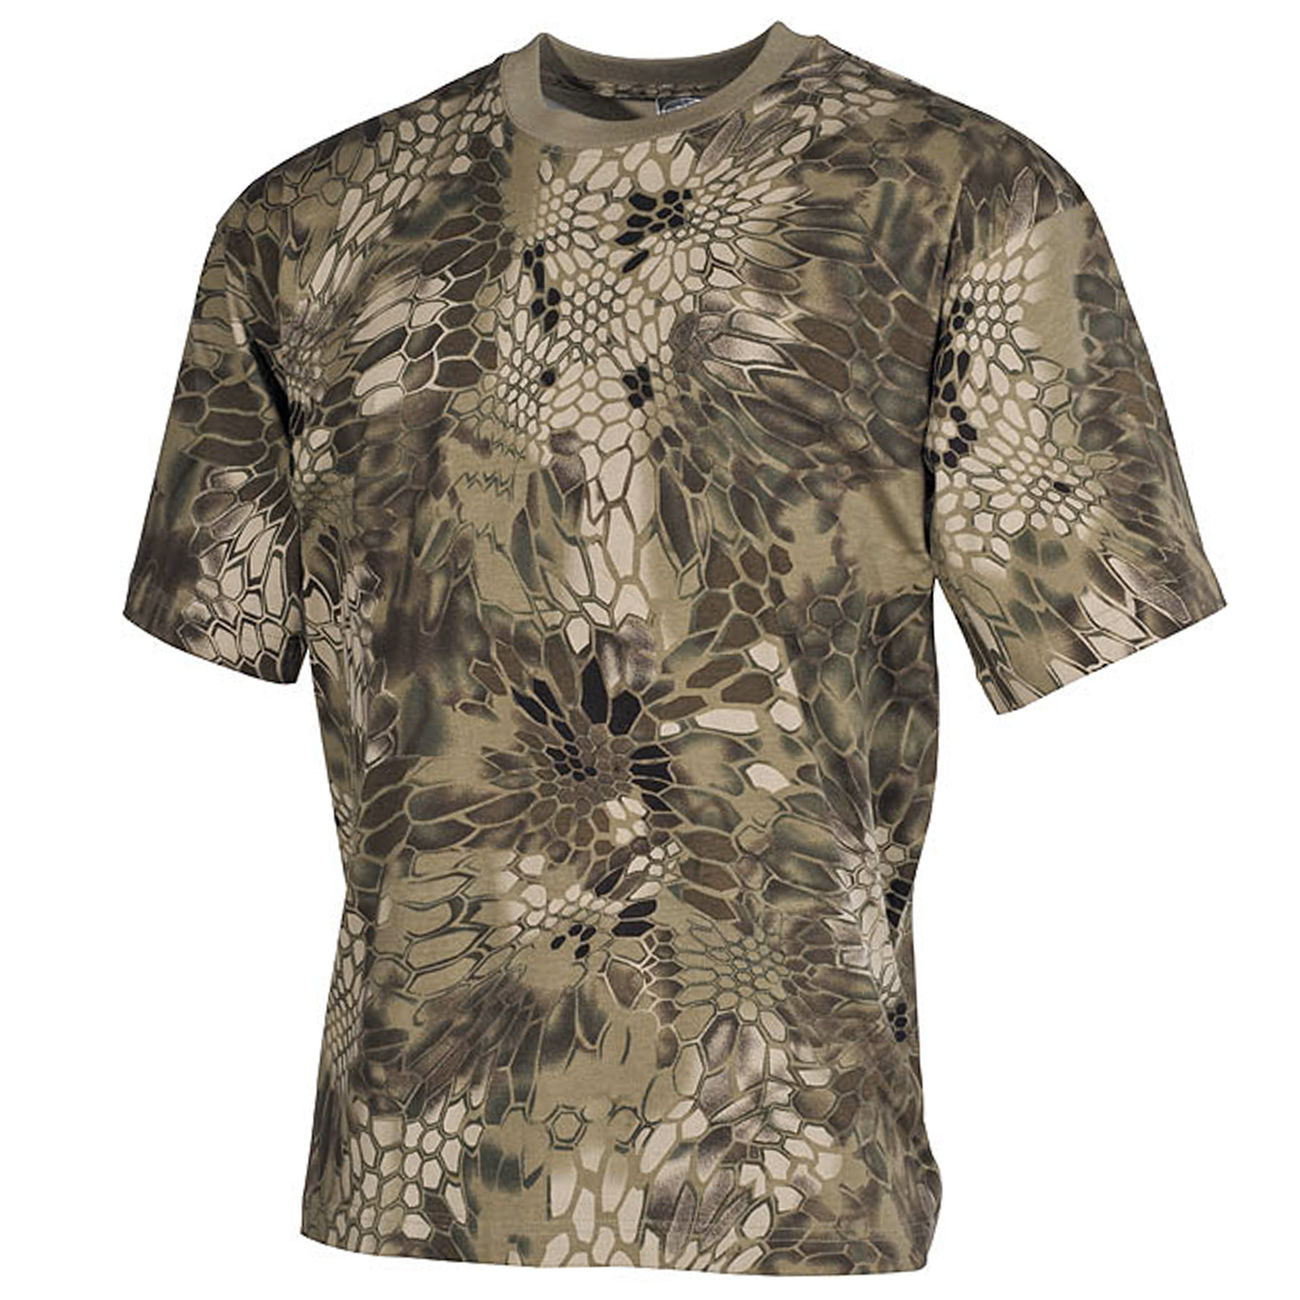 d665f3aebbd437 MFH US T-Shirt halbarm snake FG günstig kaufen - Kotte & Zeller